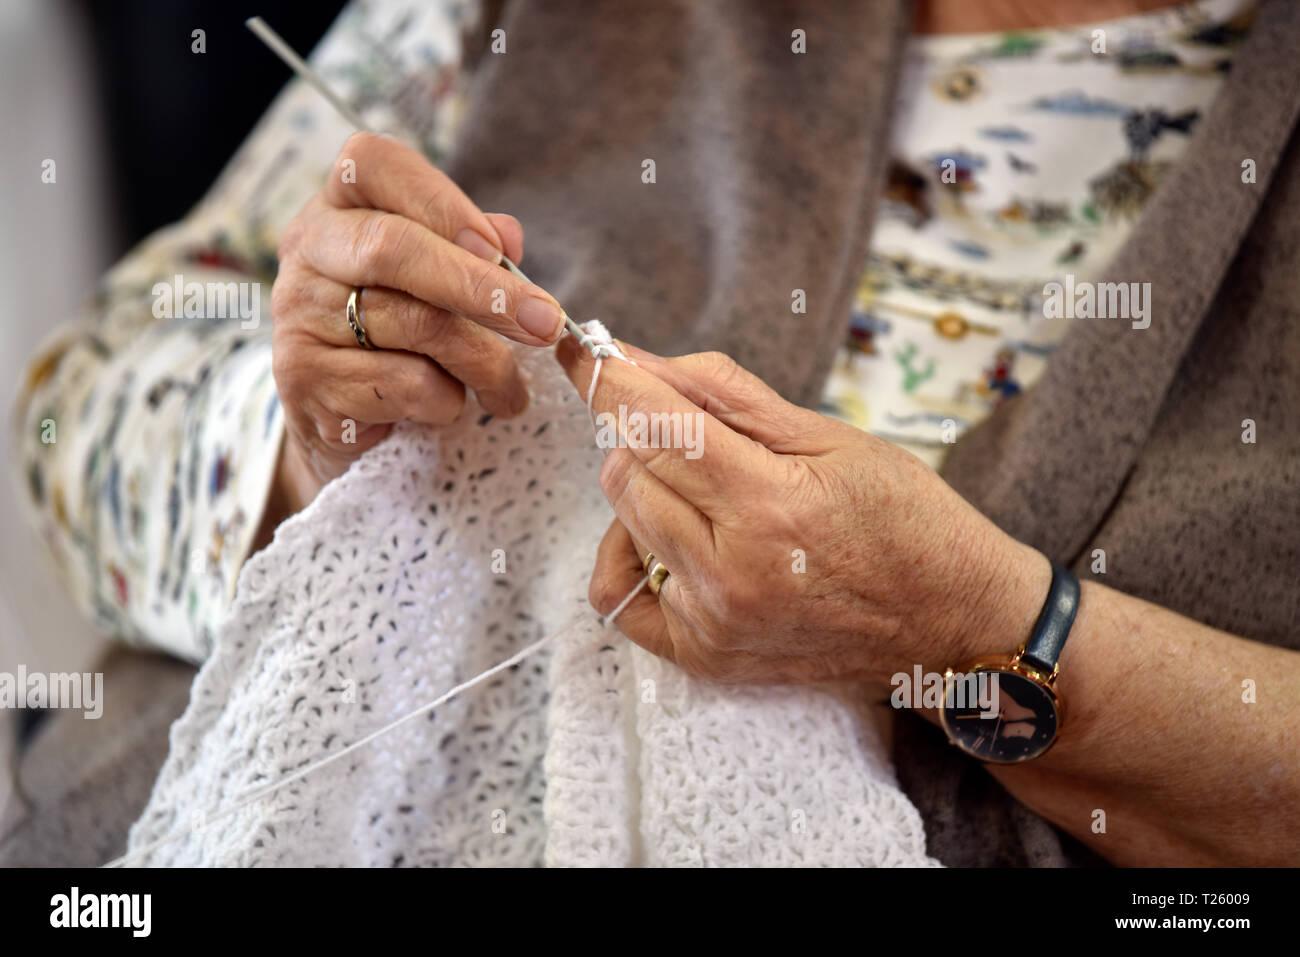 Elderly woman knitting, Chawton, near Alton, Hampshire, UK. - Stock Image